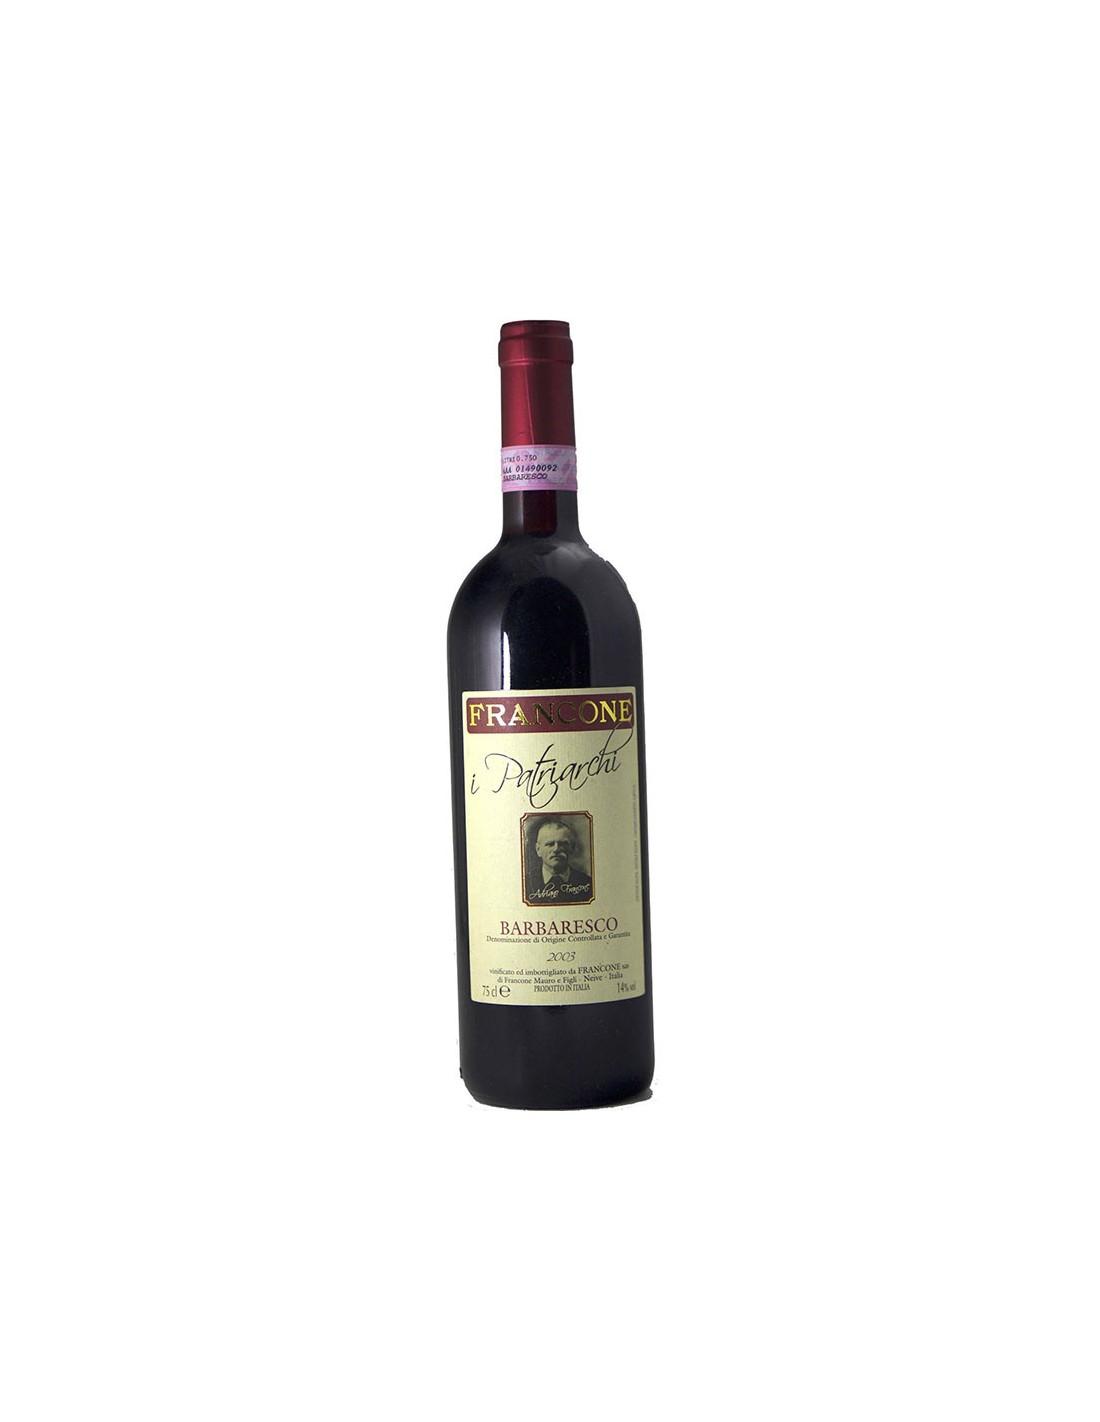 BARBARESCO I PATRIARCHI 2003 FRANCONE Grandi Bottiglie